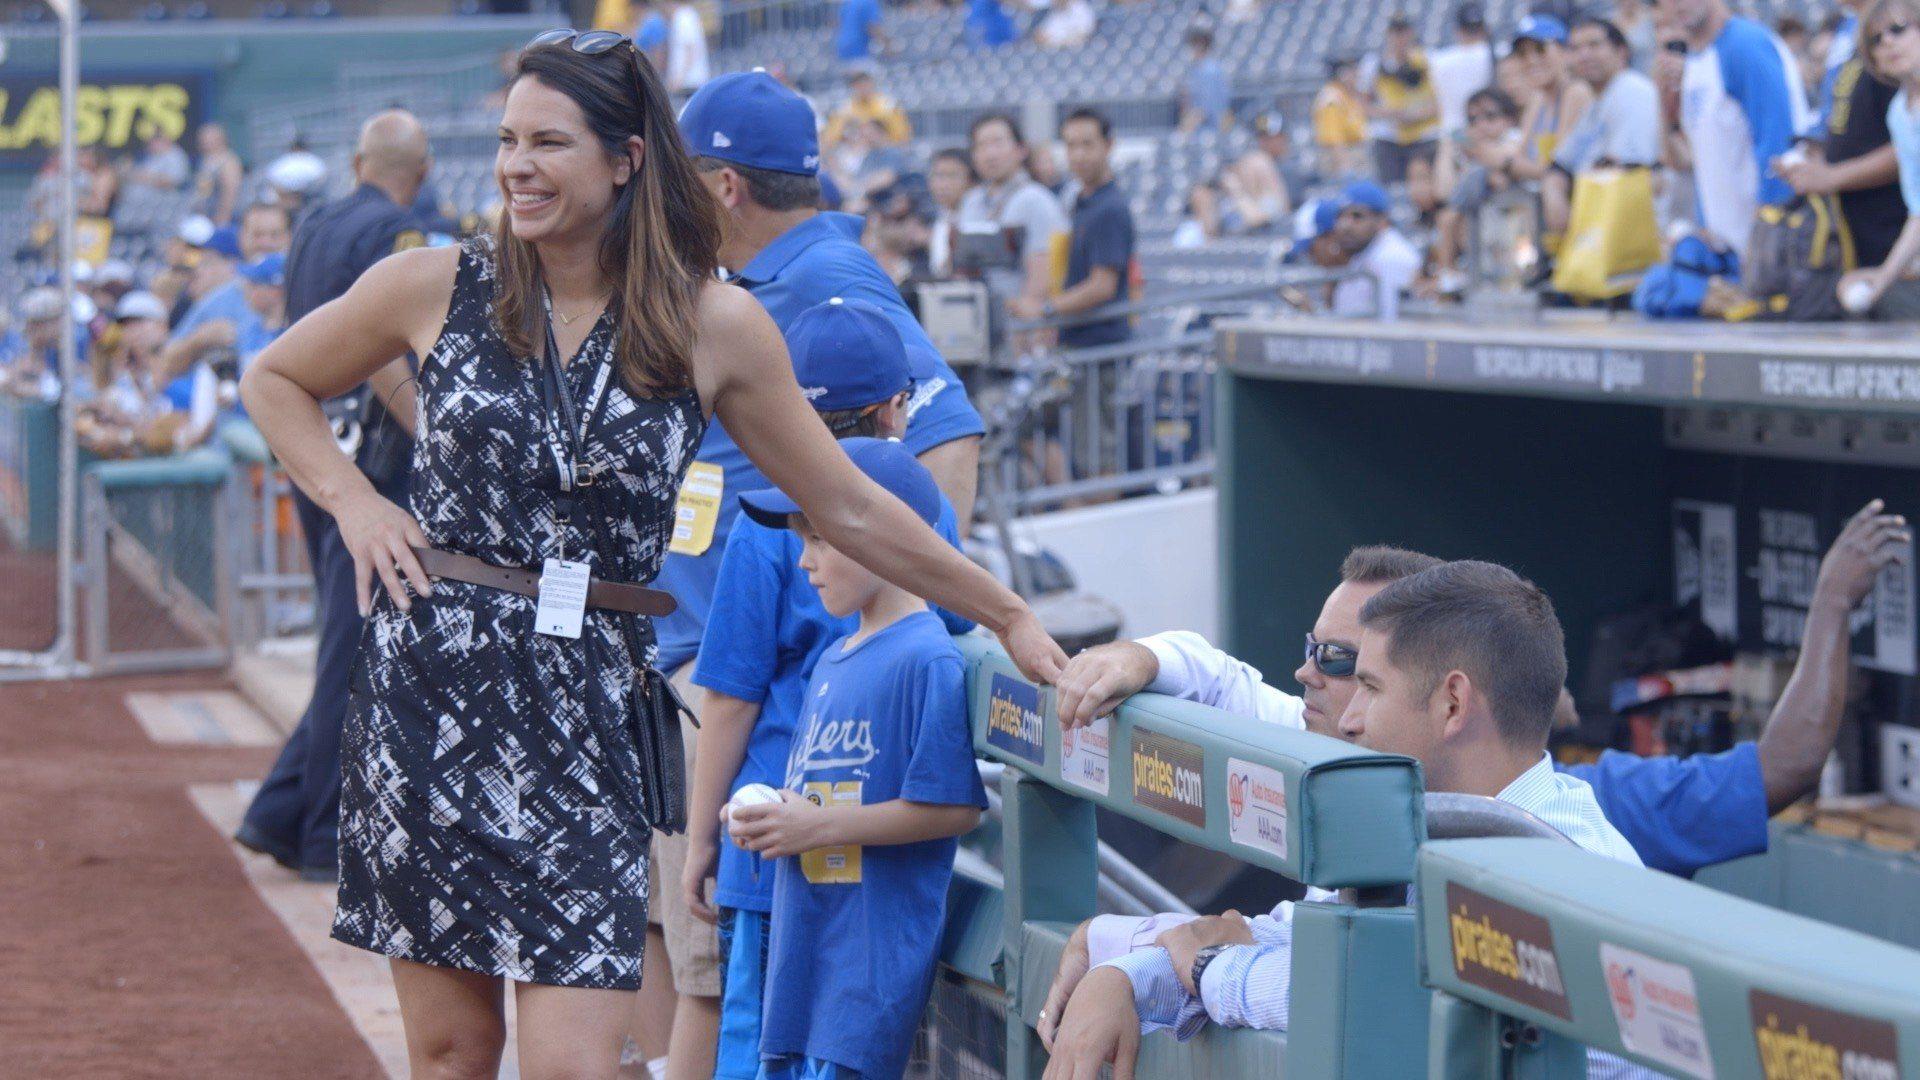 mendoza makes espn's baseball broadcast watchable.